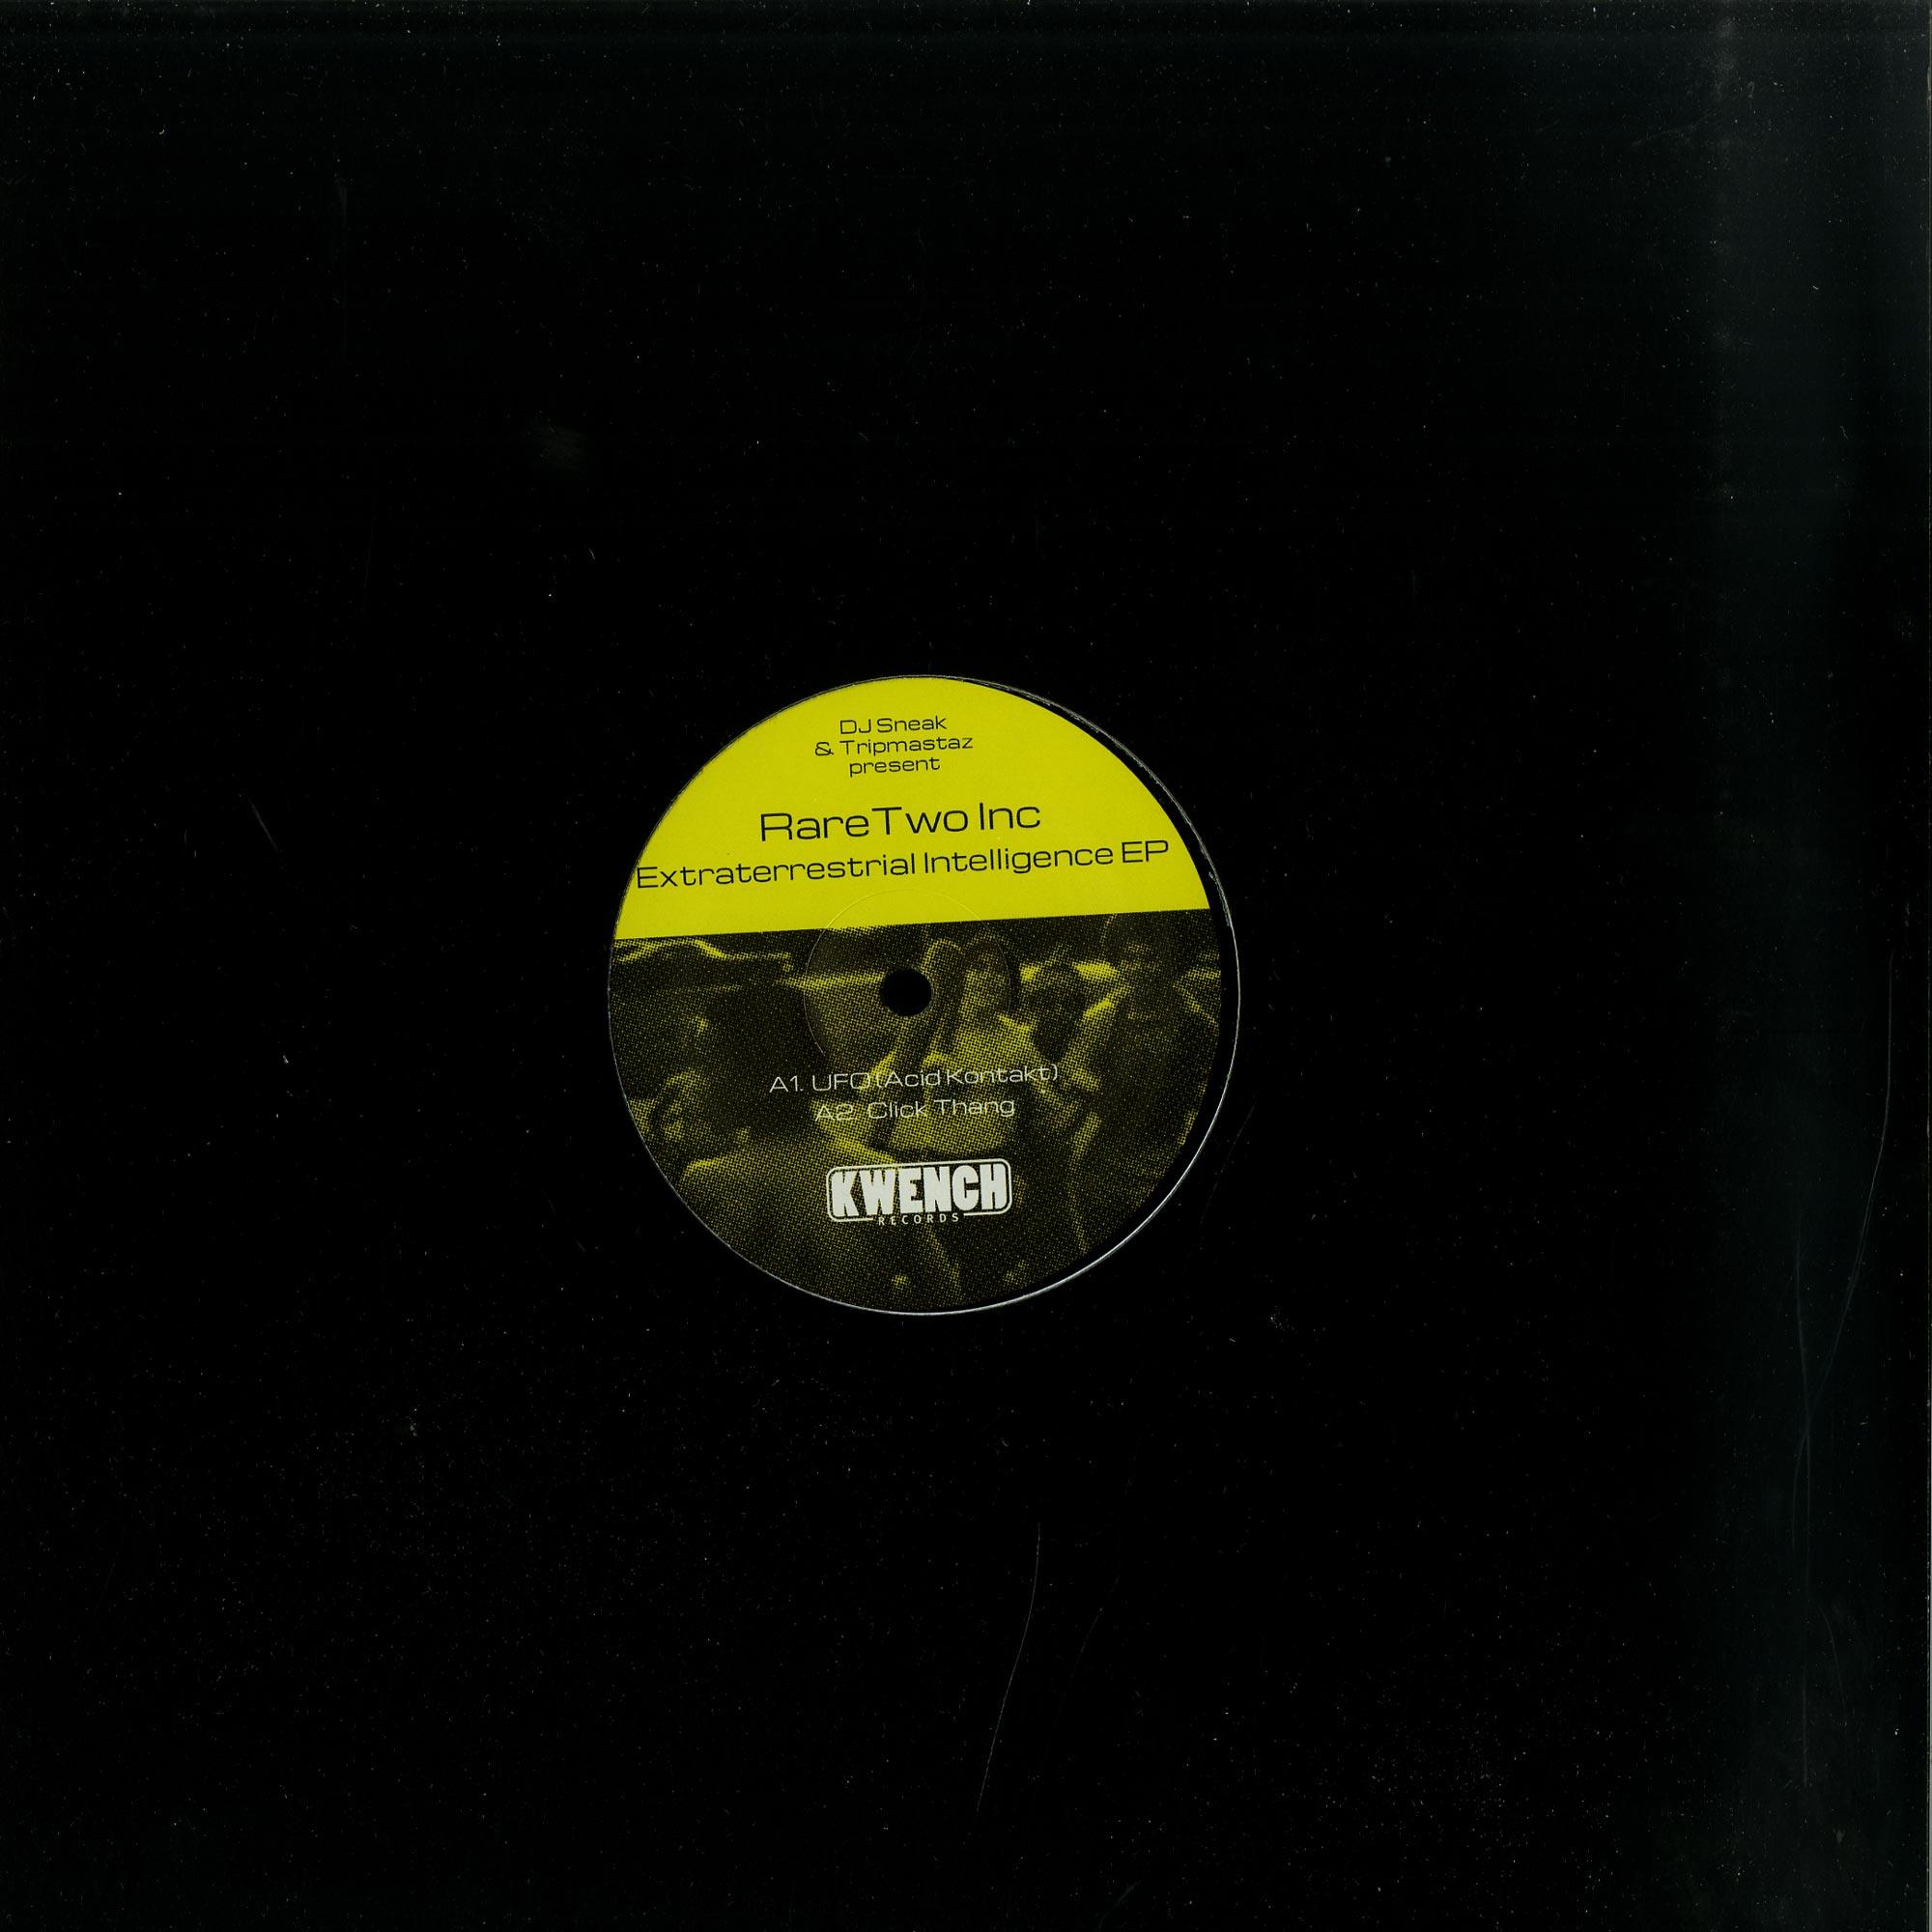 DJ Sneak & Tripmastaz Present Rare Two Inc. - EXTRATERRESTRIAL INTELLIGENCE EP